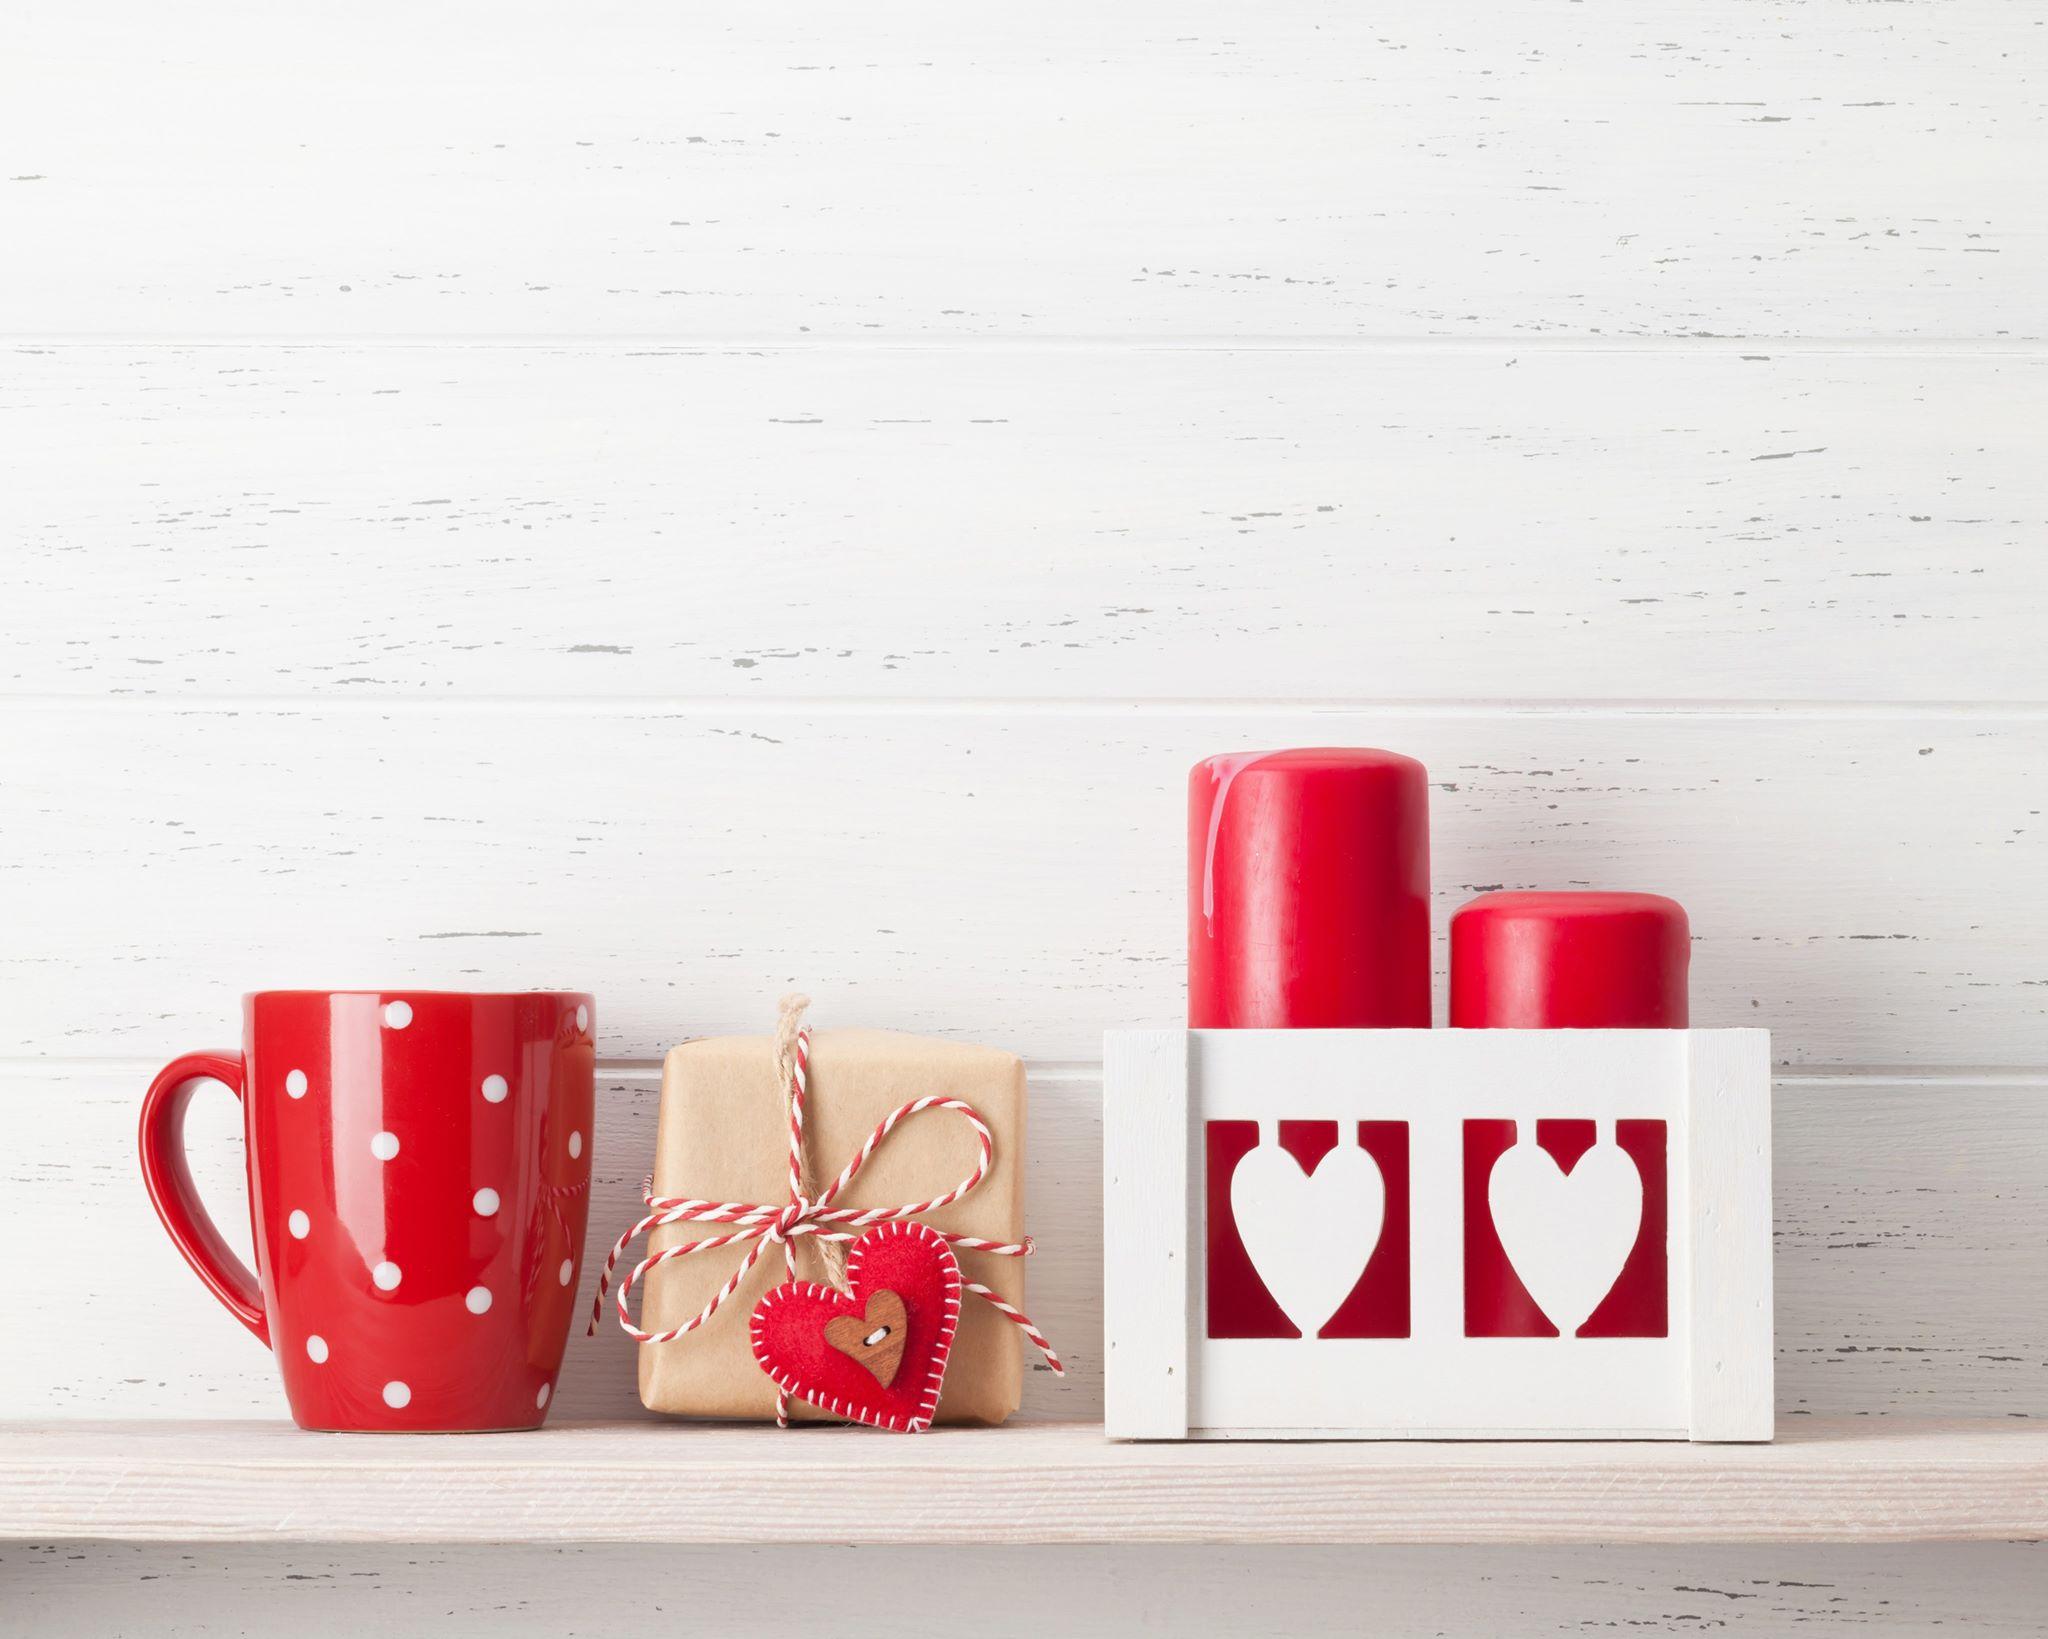 Valentines day images 24 صور عيد الحب